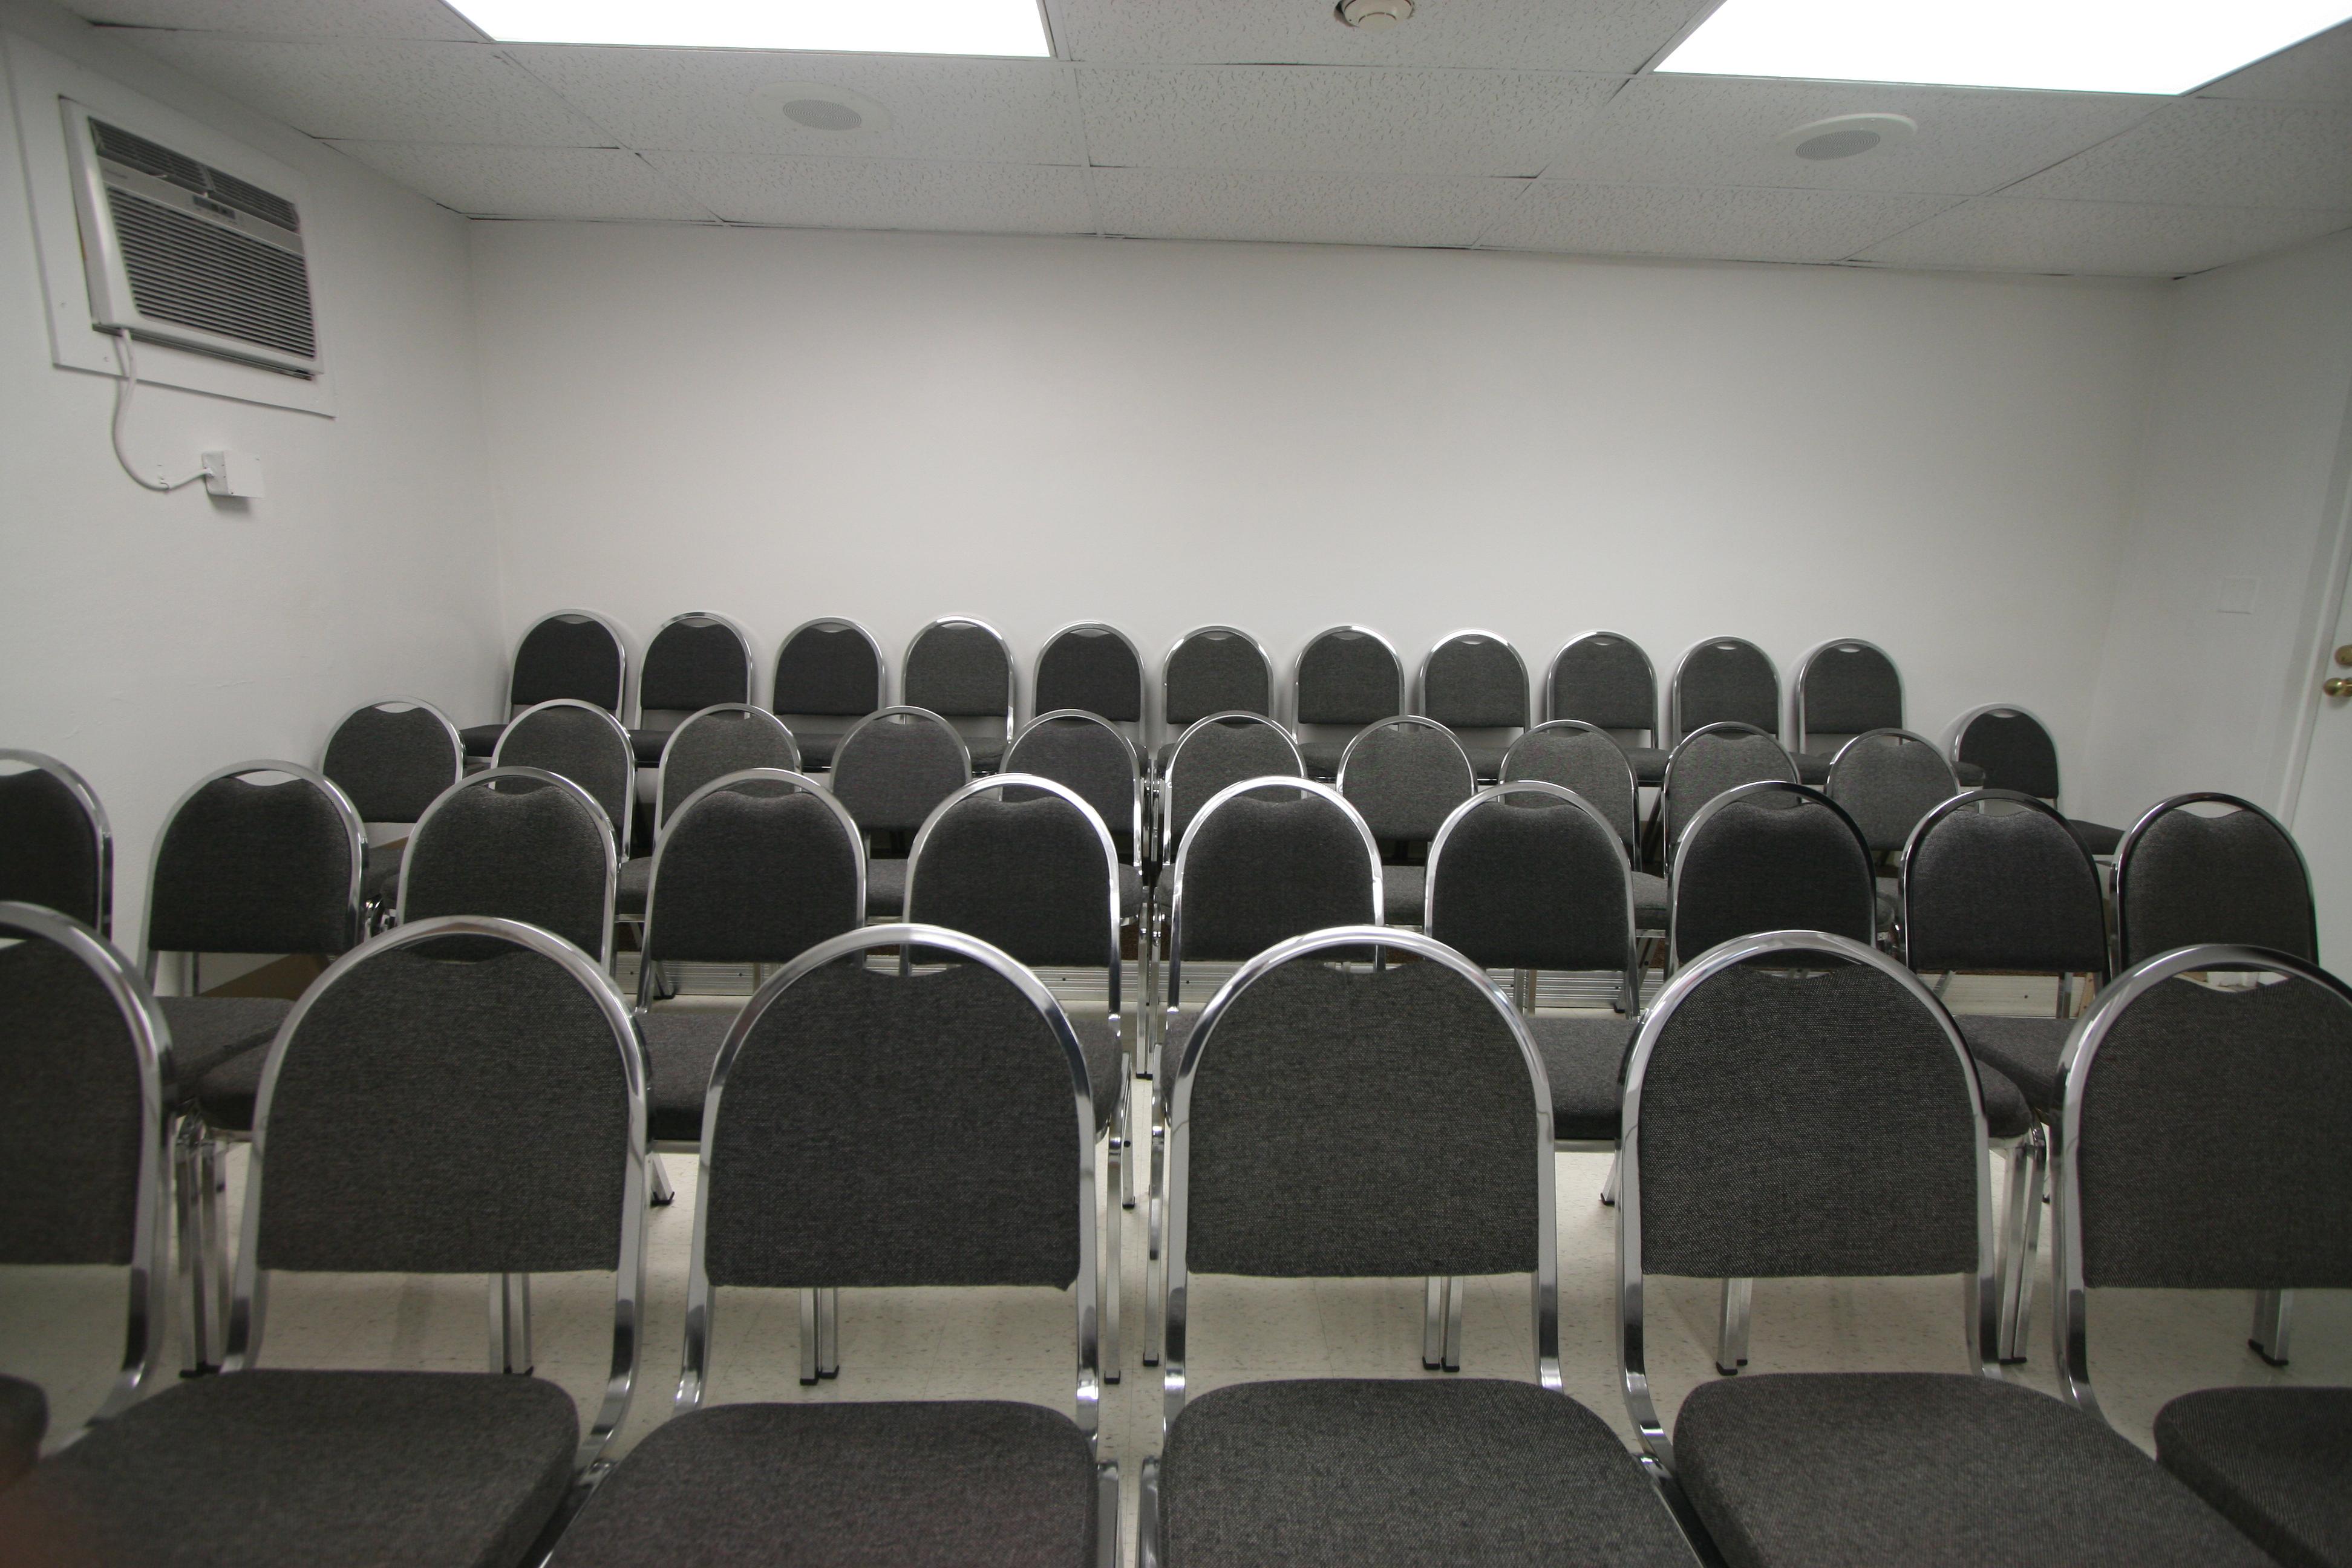 florida executions witness spectator room